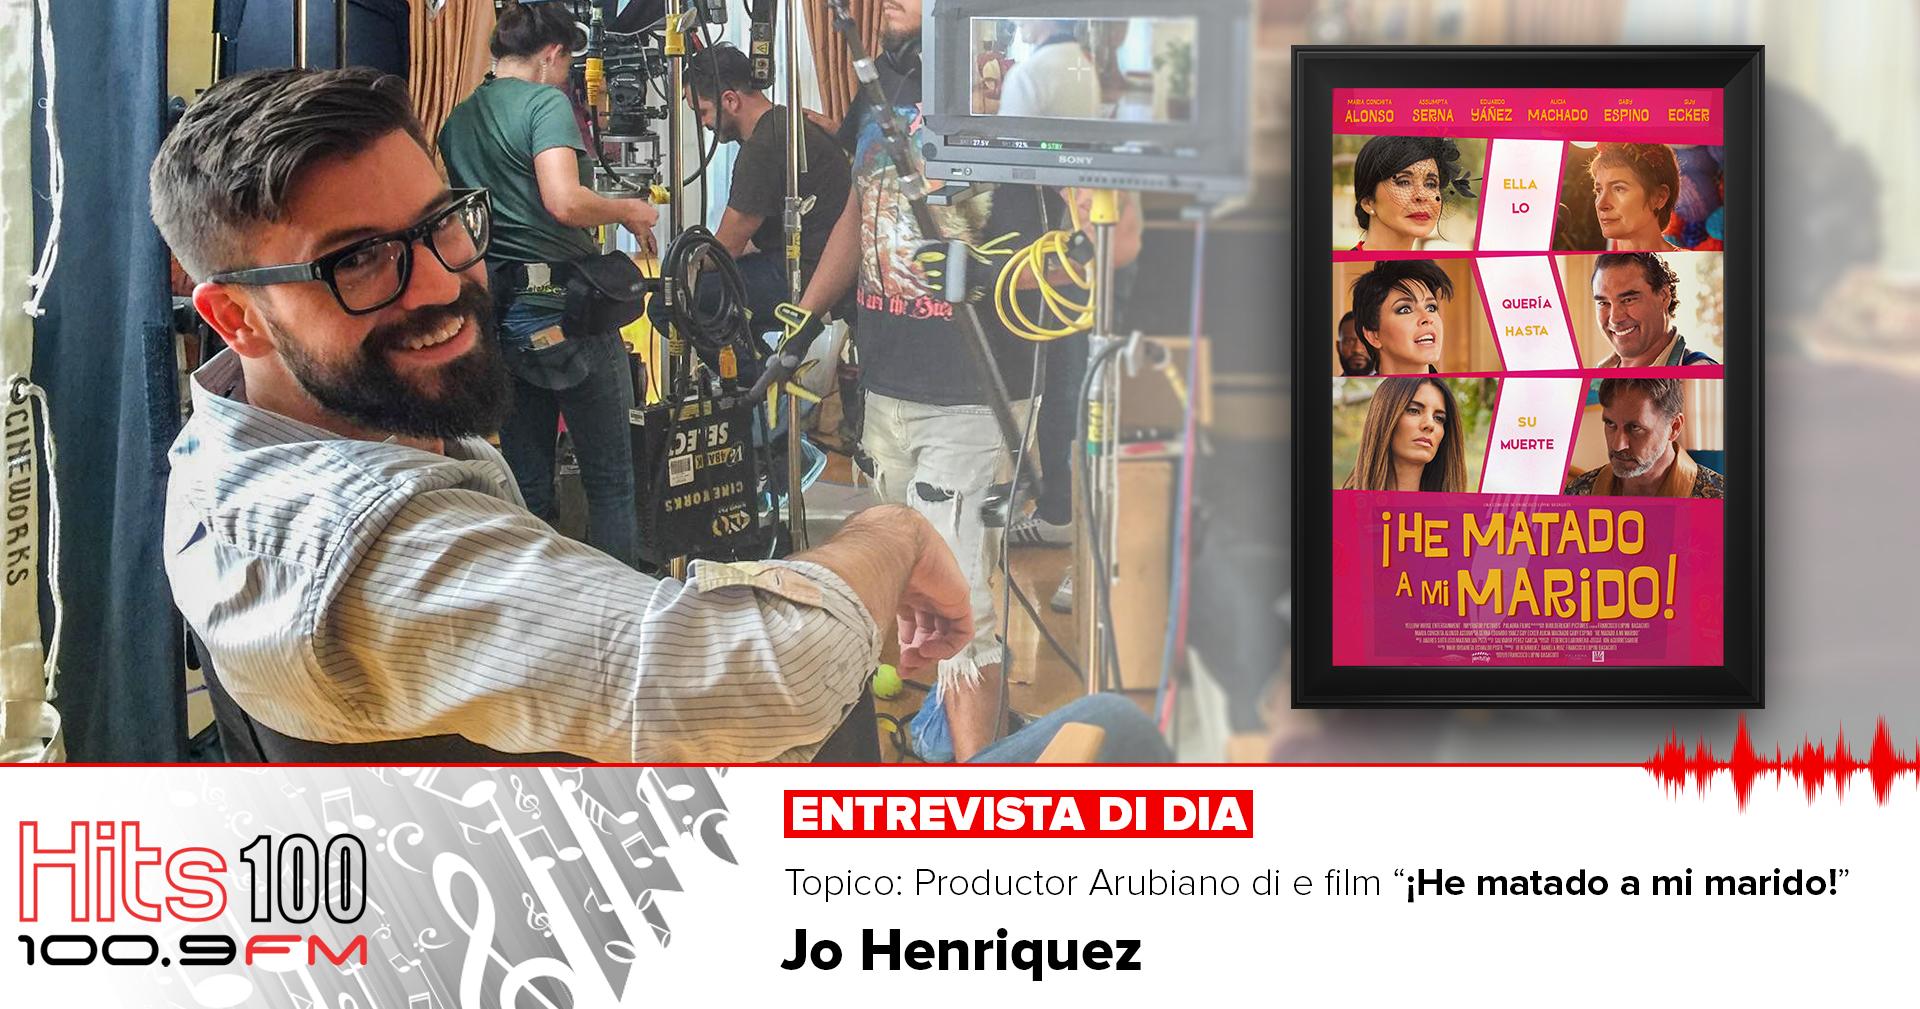 Jo-Henriquez.jpg